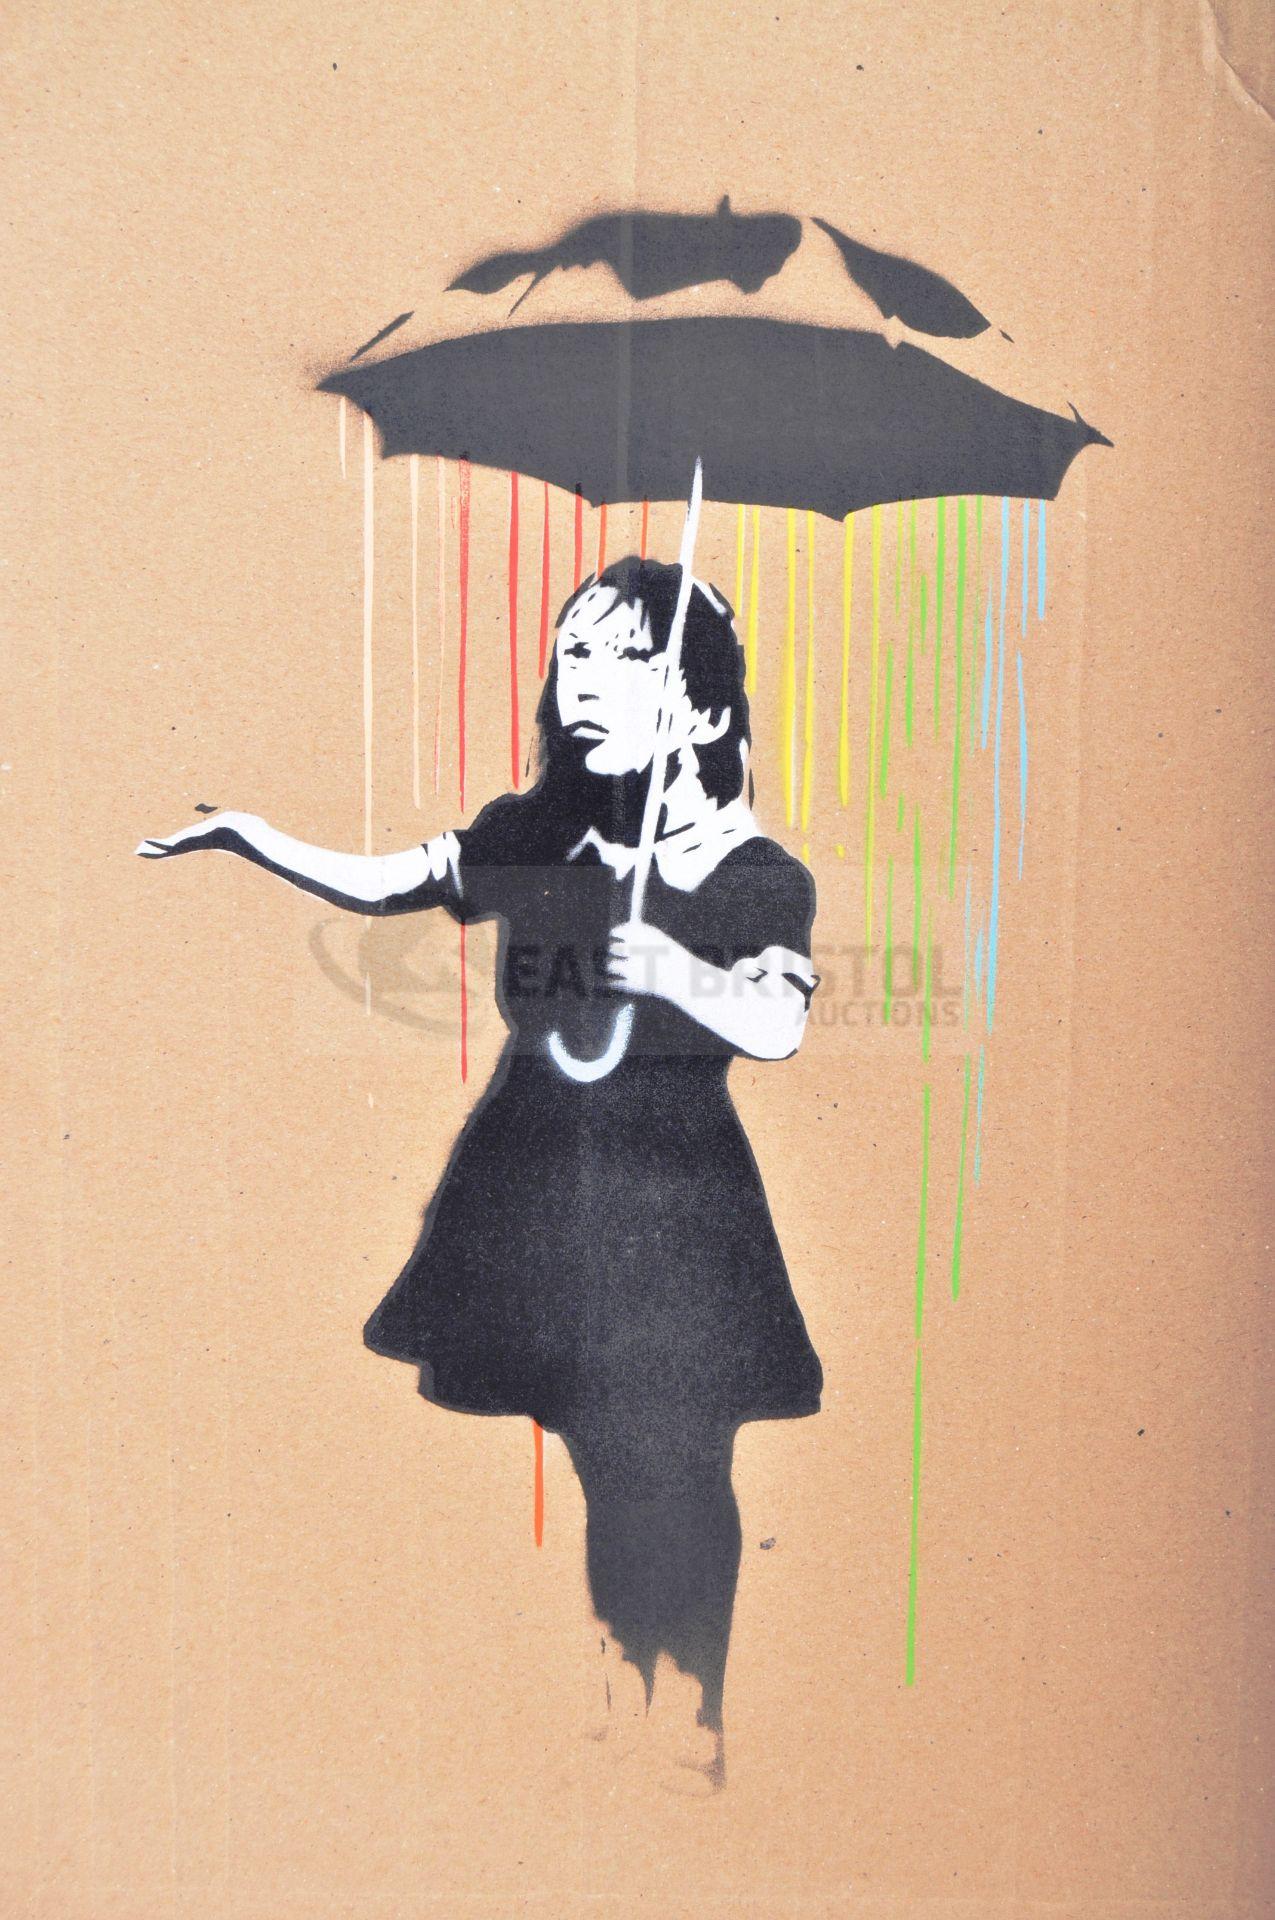 BANKSY - DISMALAND 2015 - UMBRELLA GIRL - Image 2 of 3